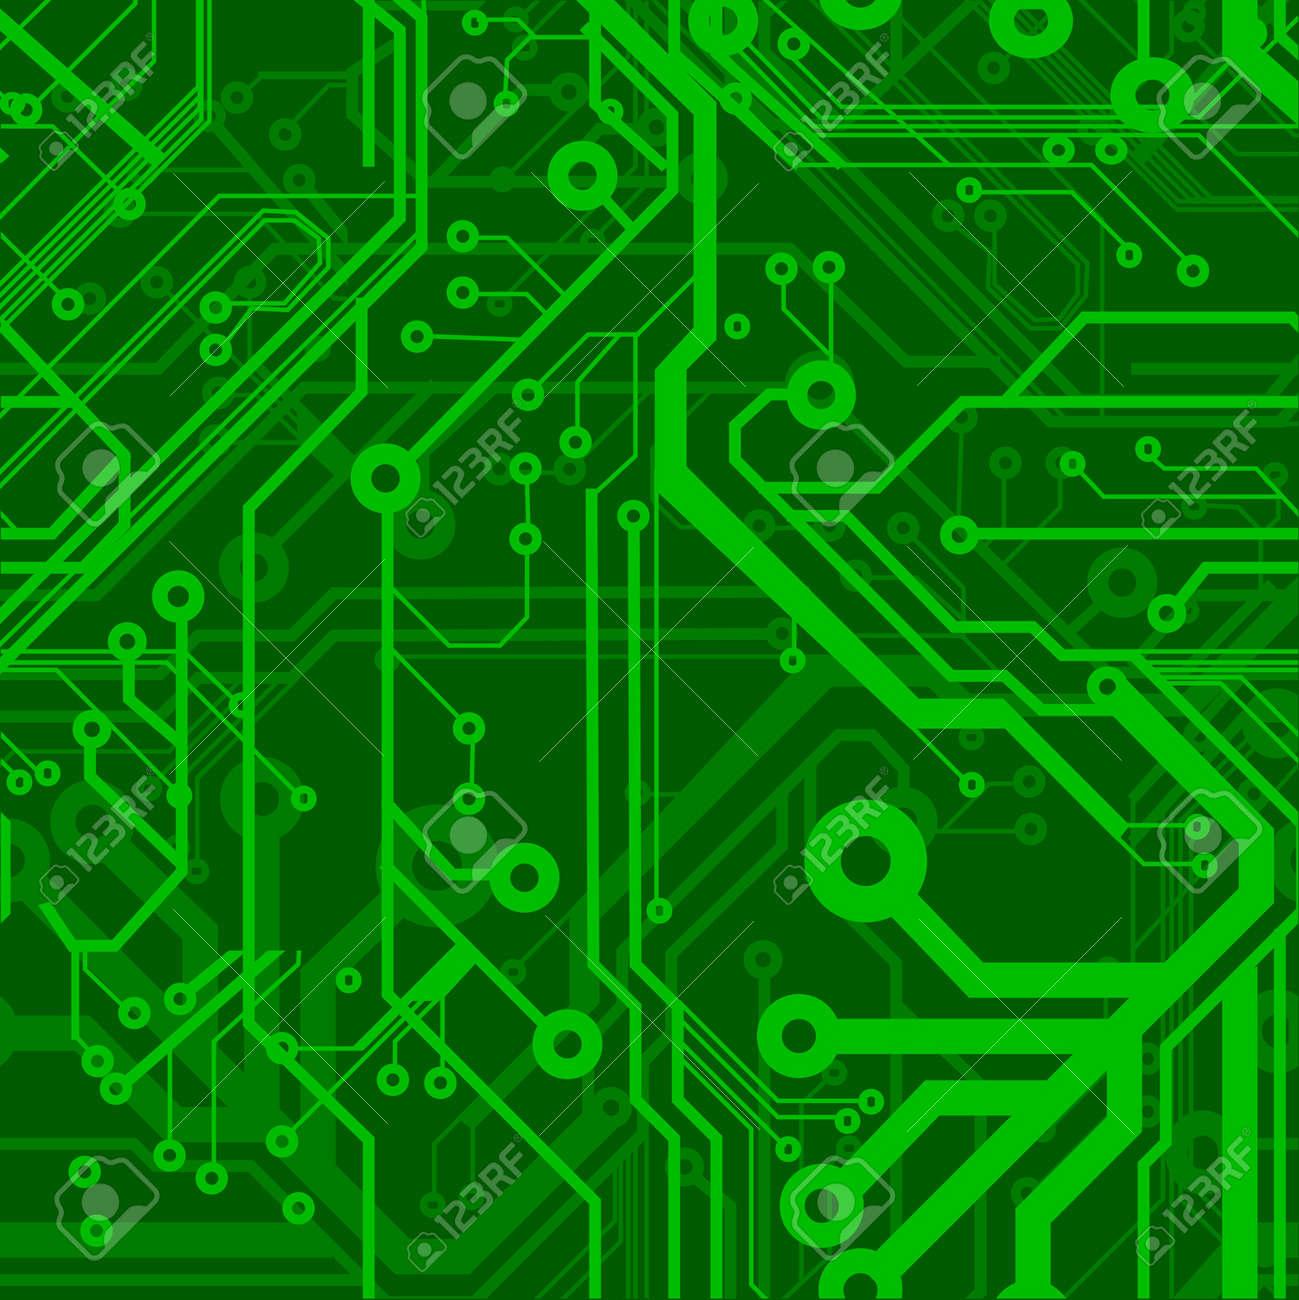 Green Seamless Printed Circuit Board Pattern Stock Vector - 4910215